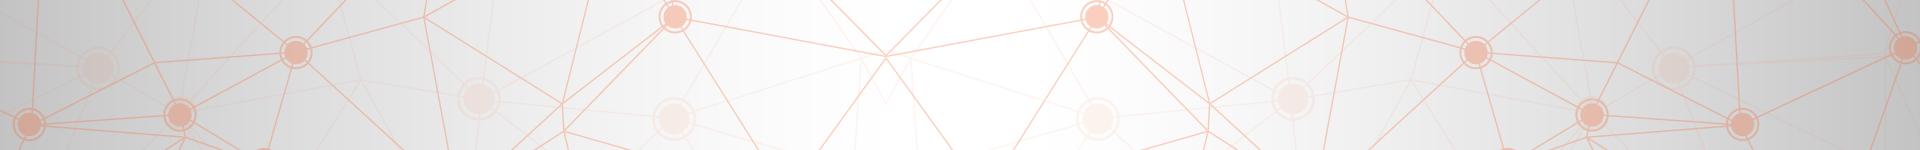 mesh-networking-pagebanner-alcadis